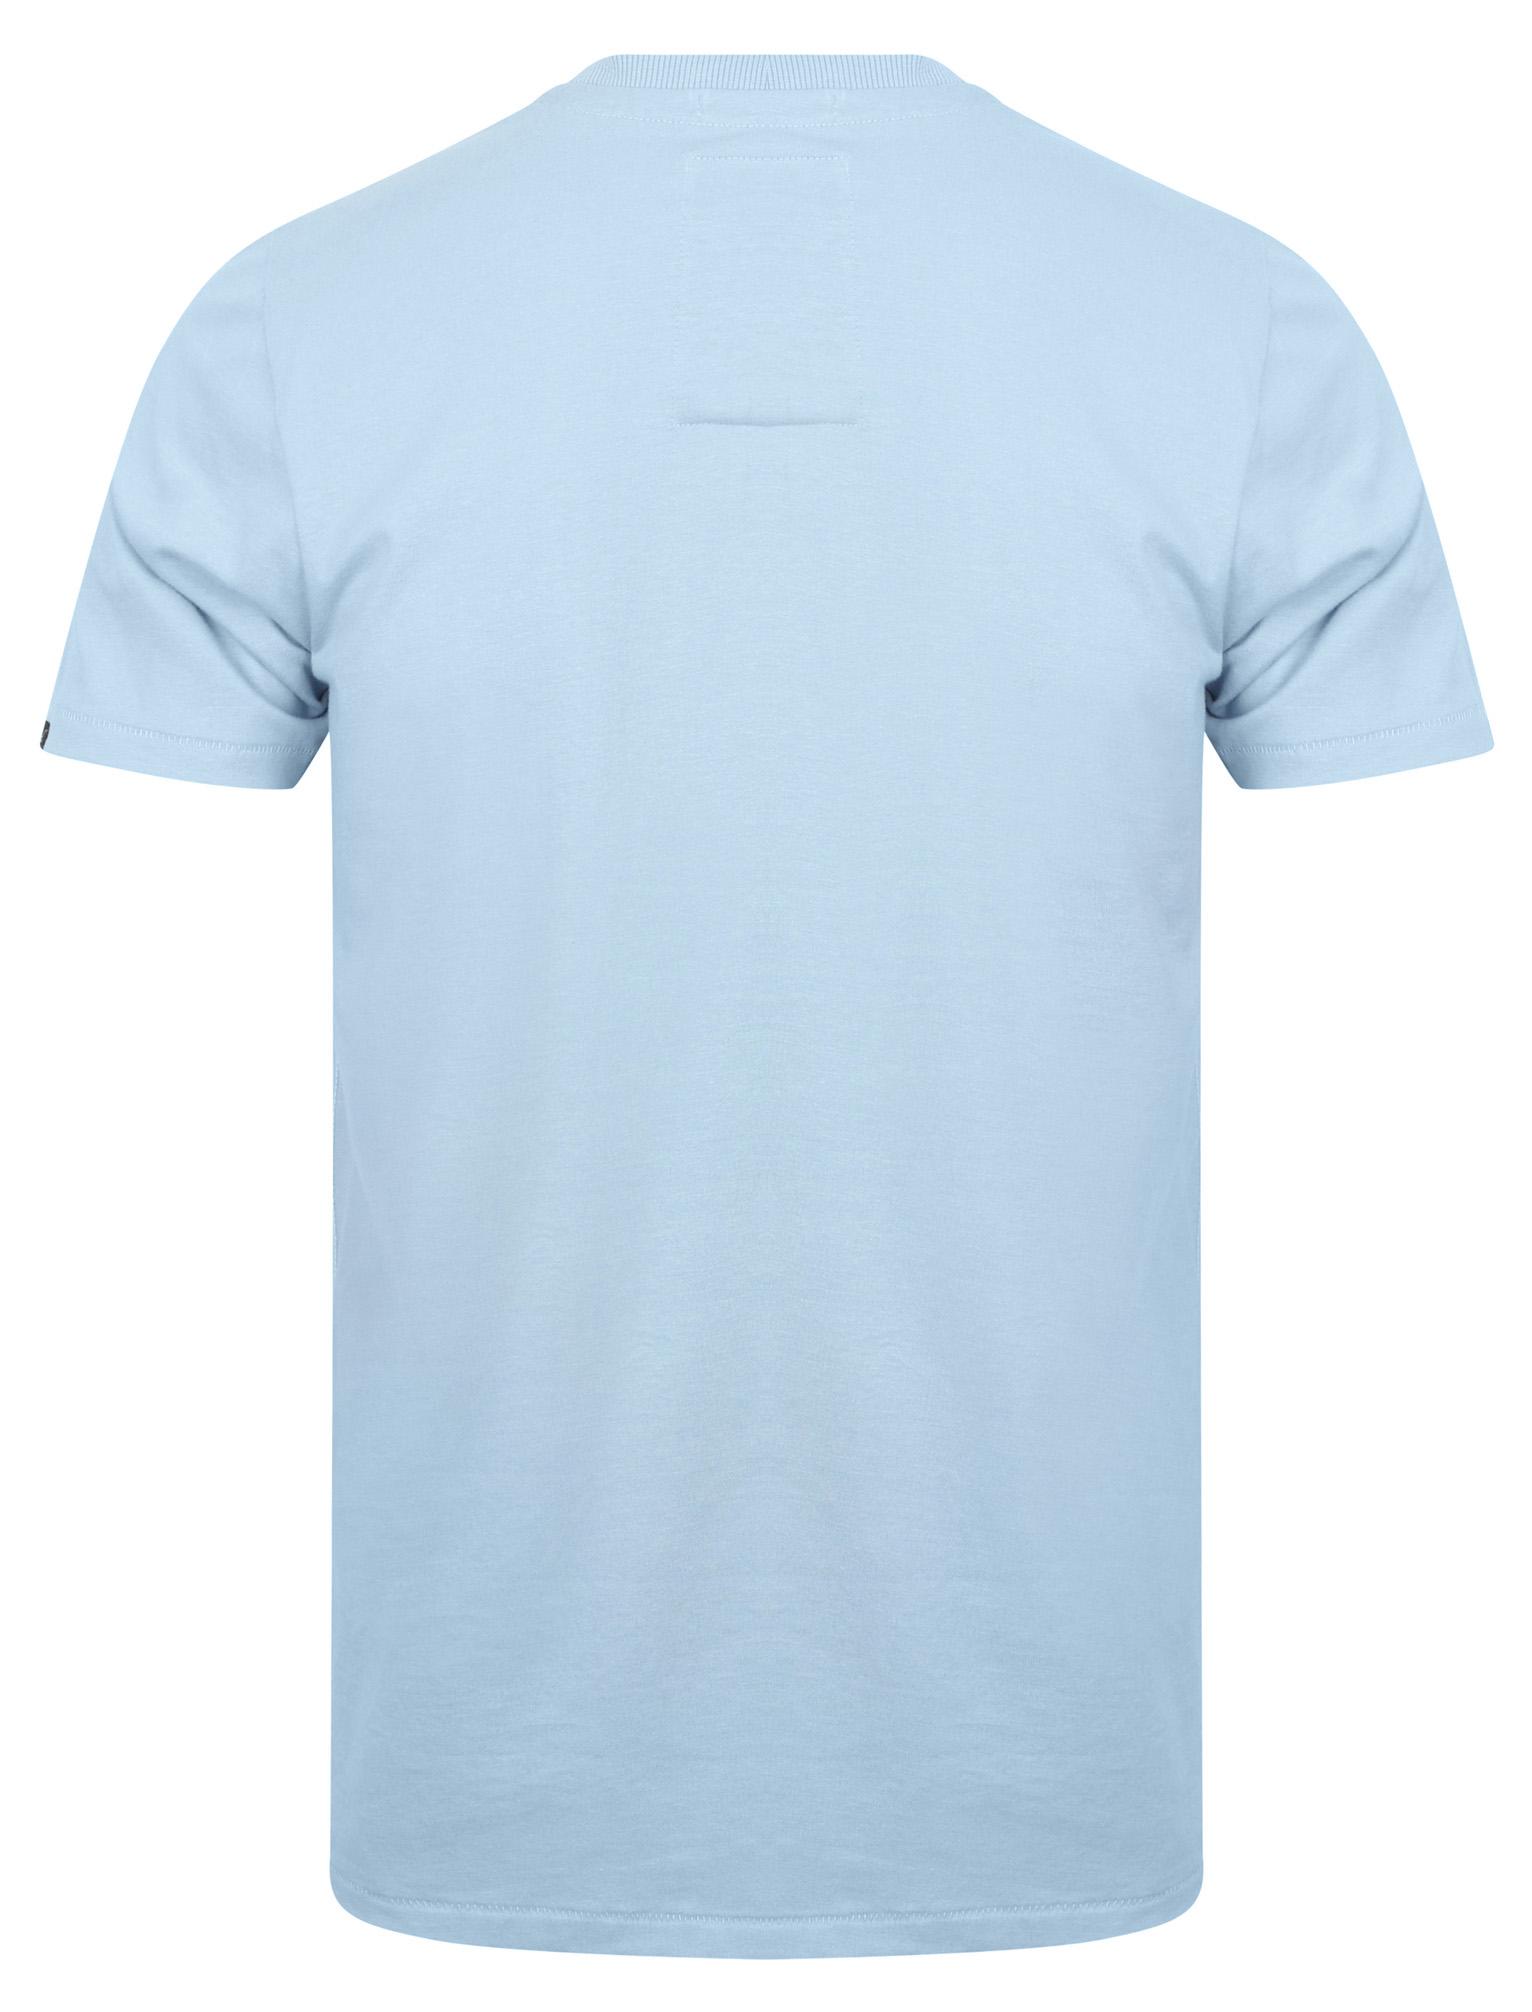 New-Mens-Tokyo-Laundry-Branded-Ellsworth-Crew-Neck-Cotton-Rich-T-shirt-Size-S-XL thumbnail 5